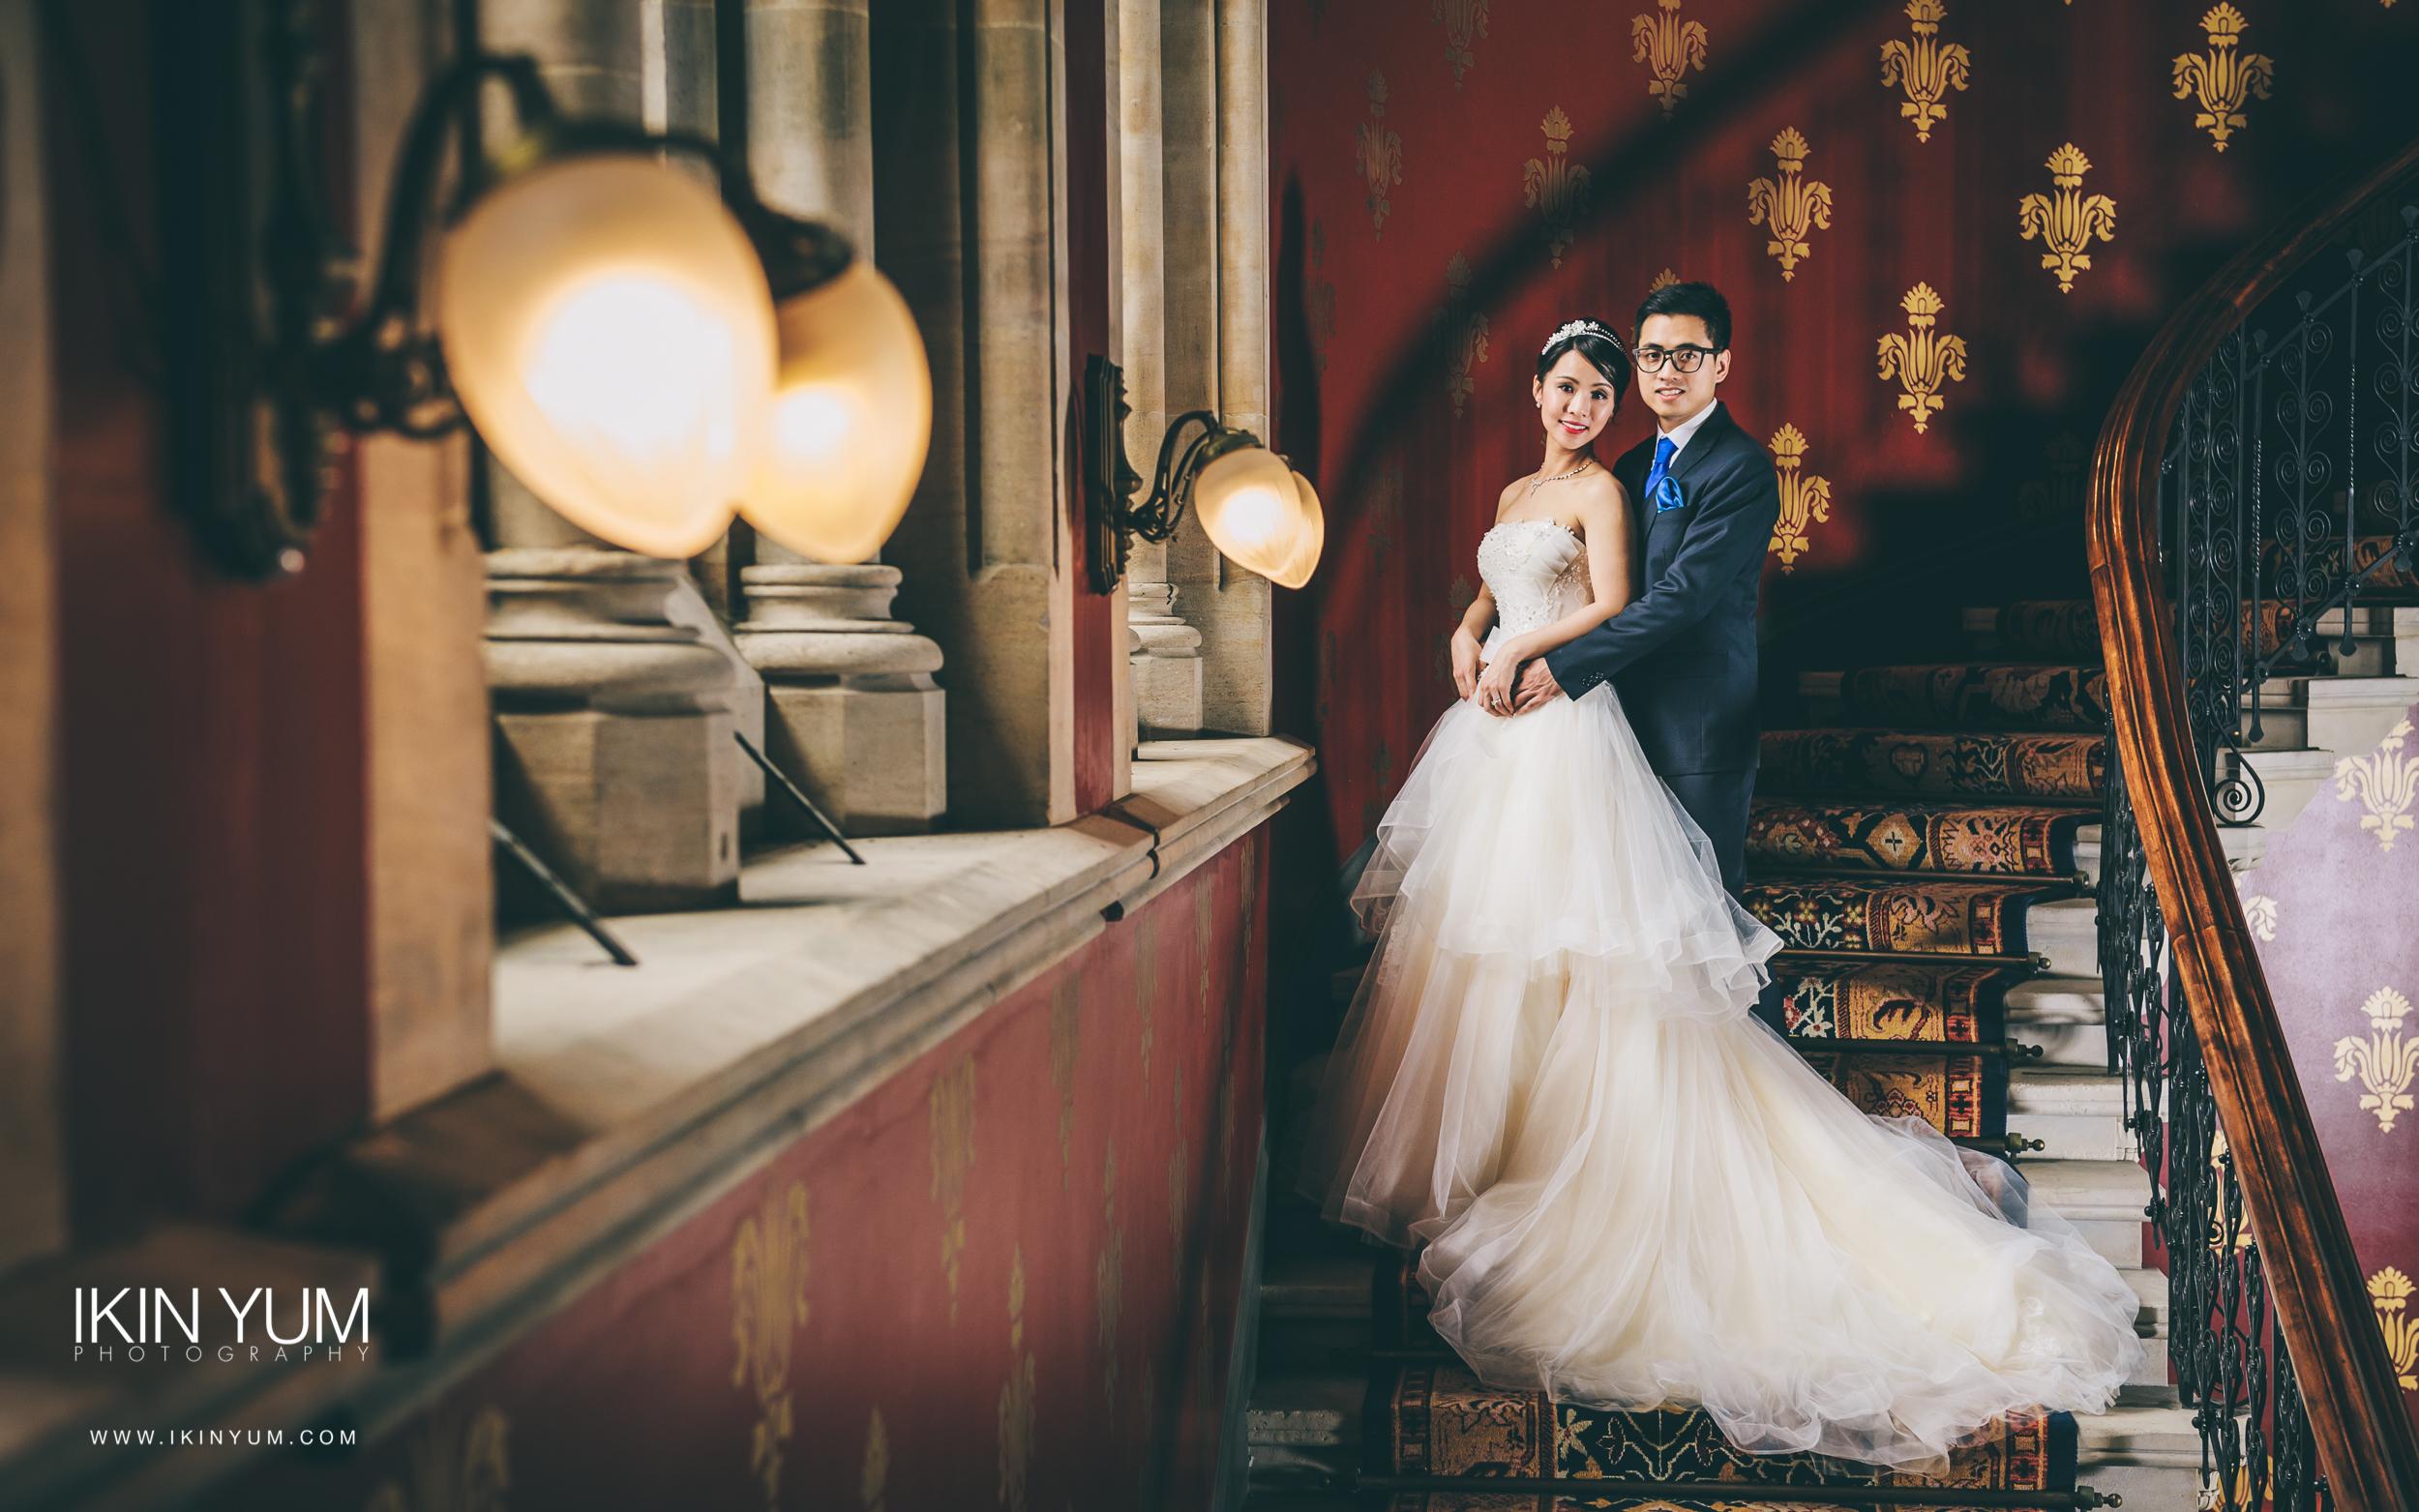 St Pancras Renaissance Hotel - Wedding - Ikin Yum Photography-051.jpg